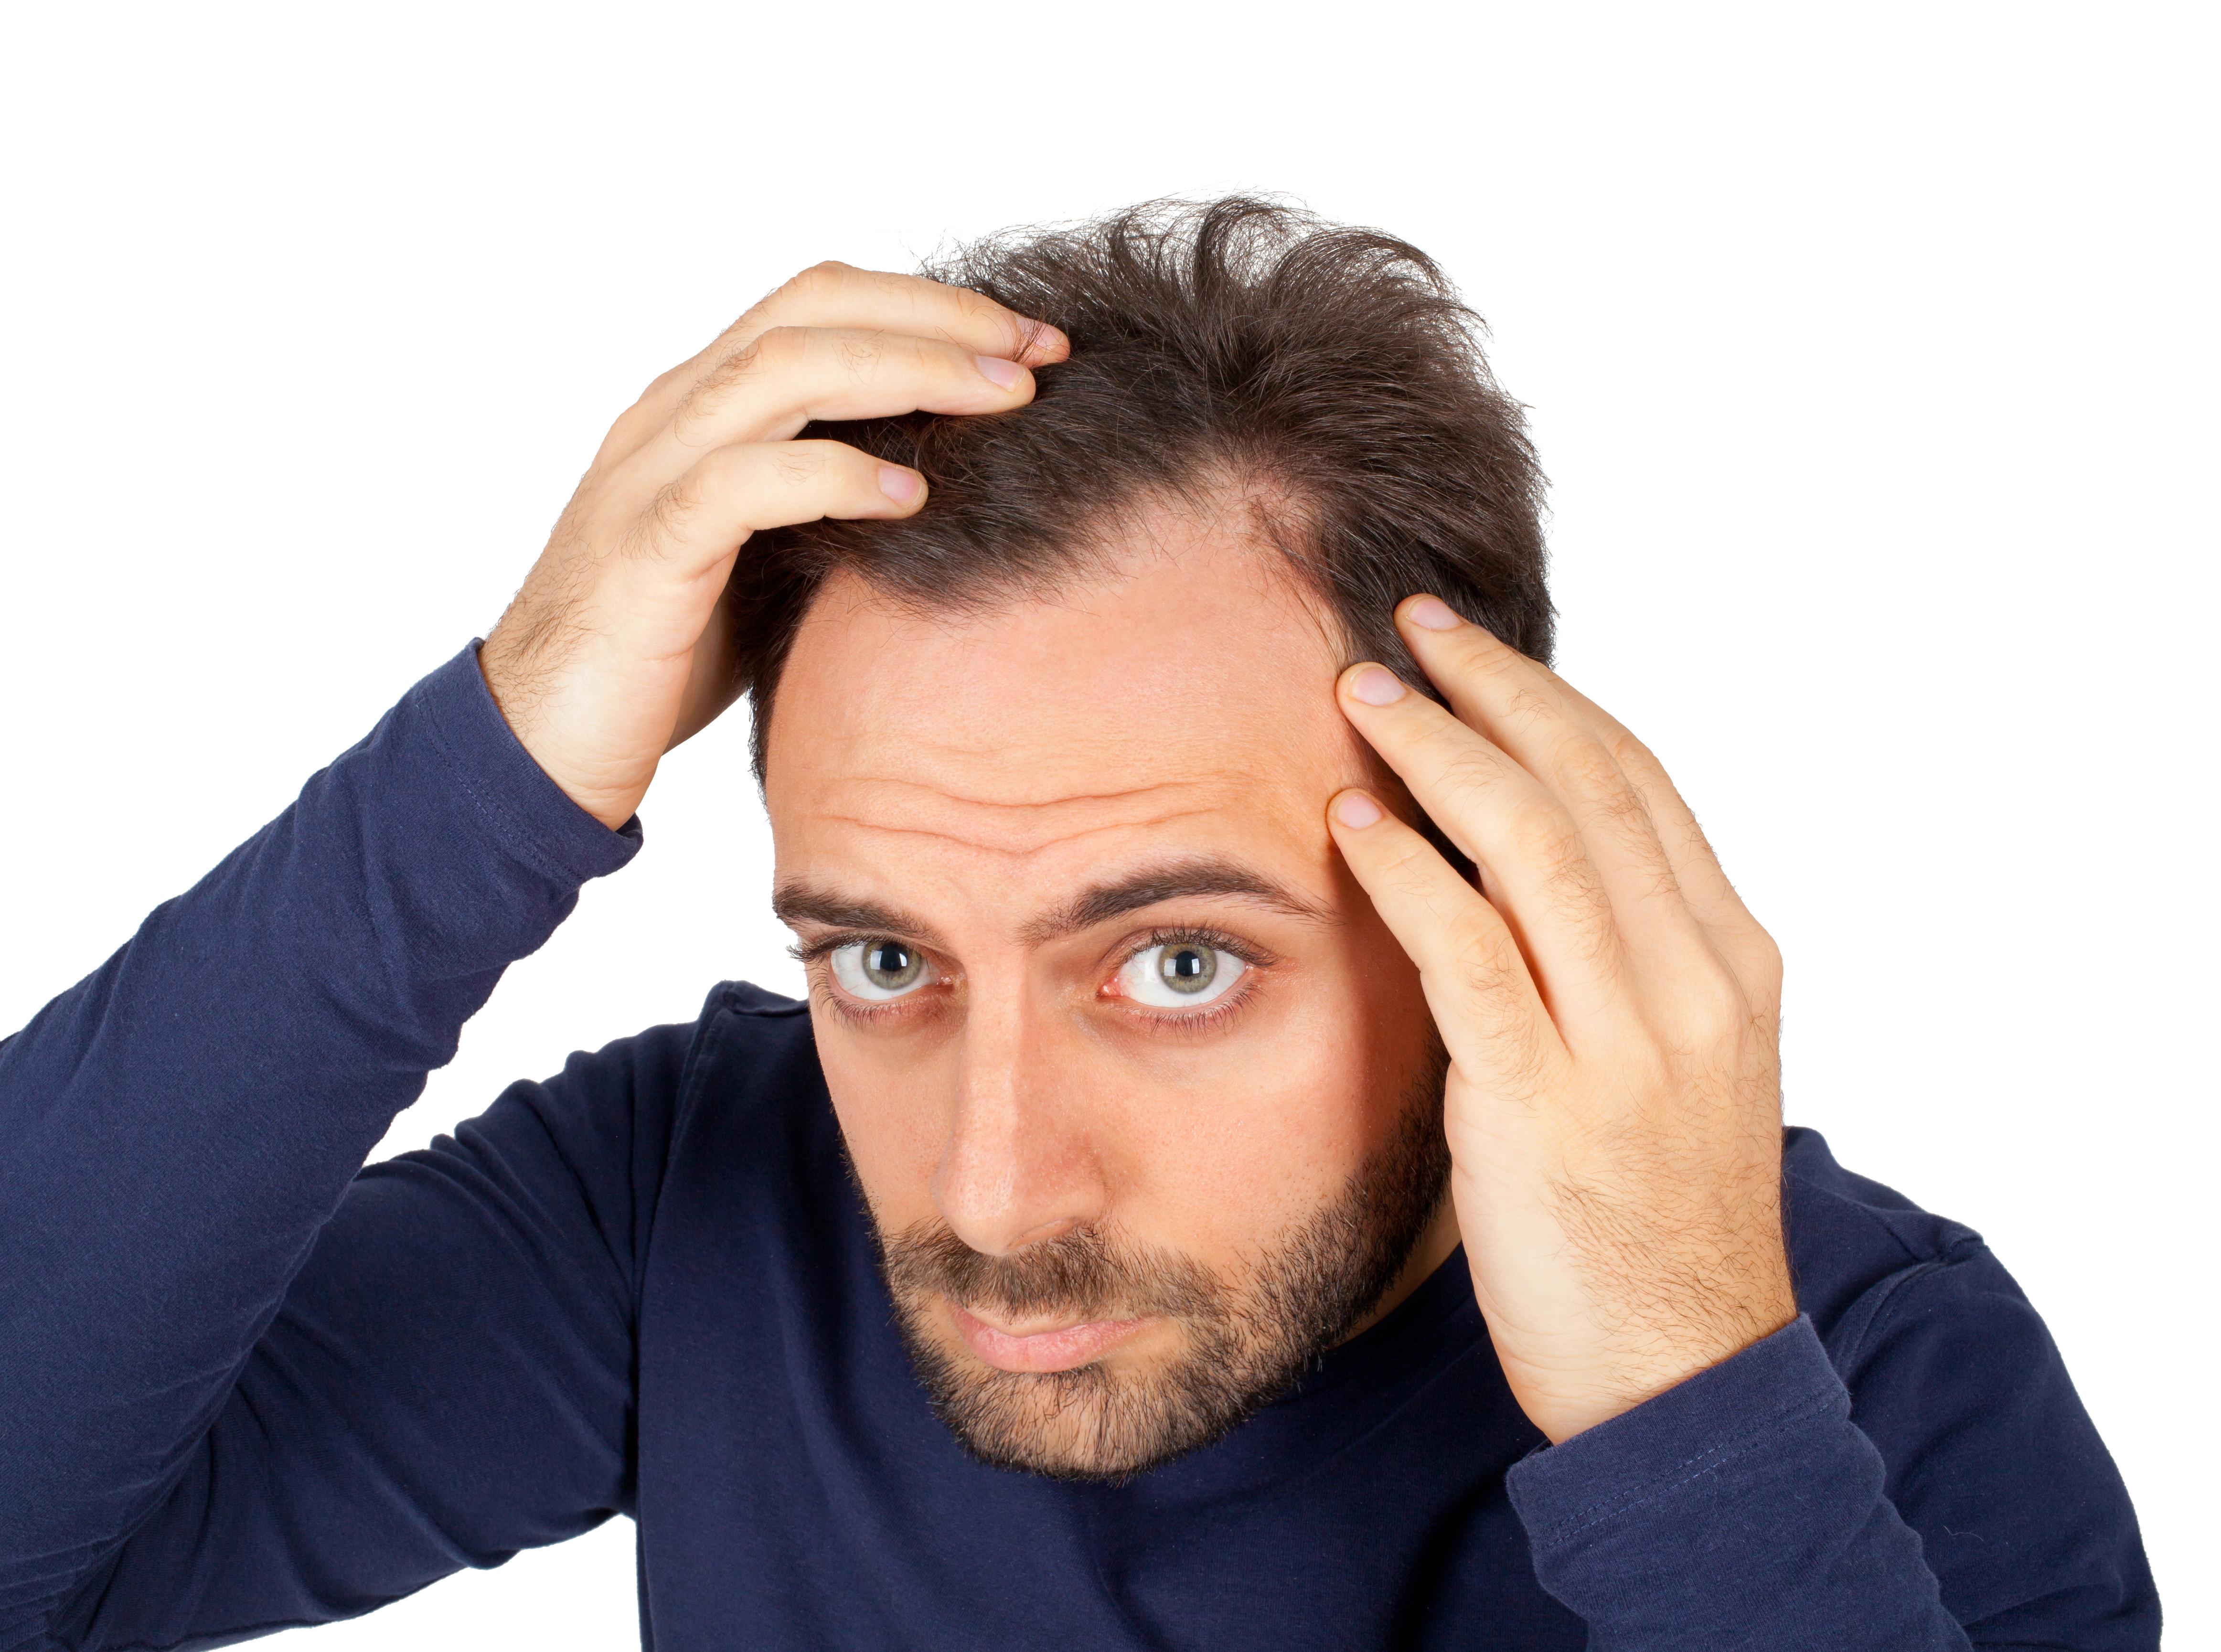 HAIR LOSS + HEAD MASSAGE